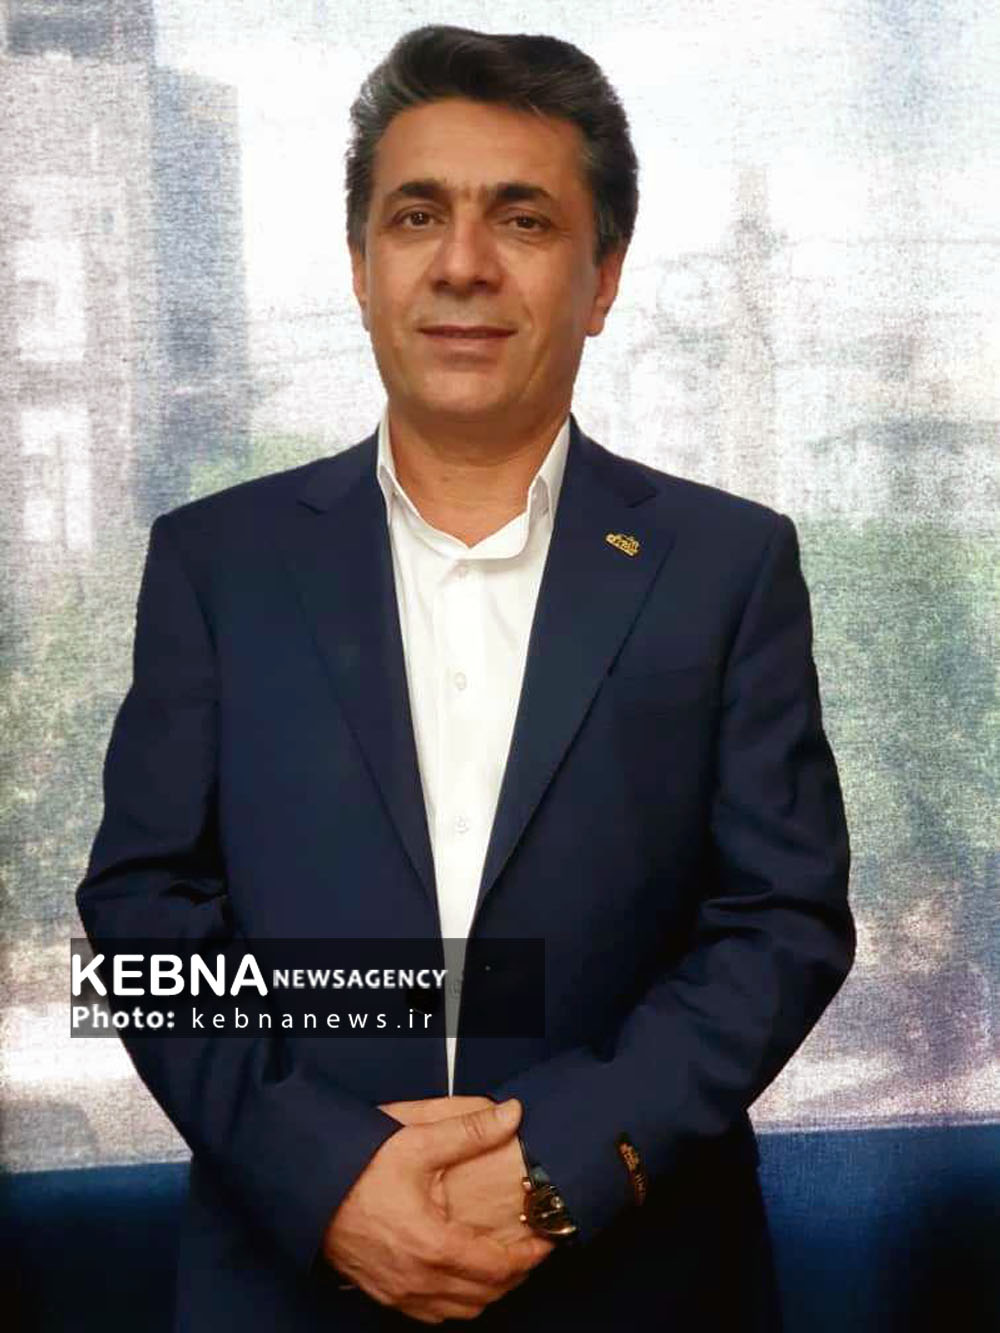 http://www.kebnanews.ir/images/docs/files/000410/nf00410918-1.jpg